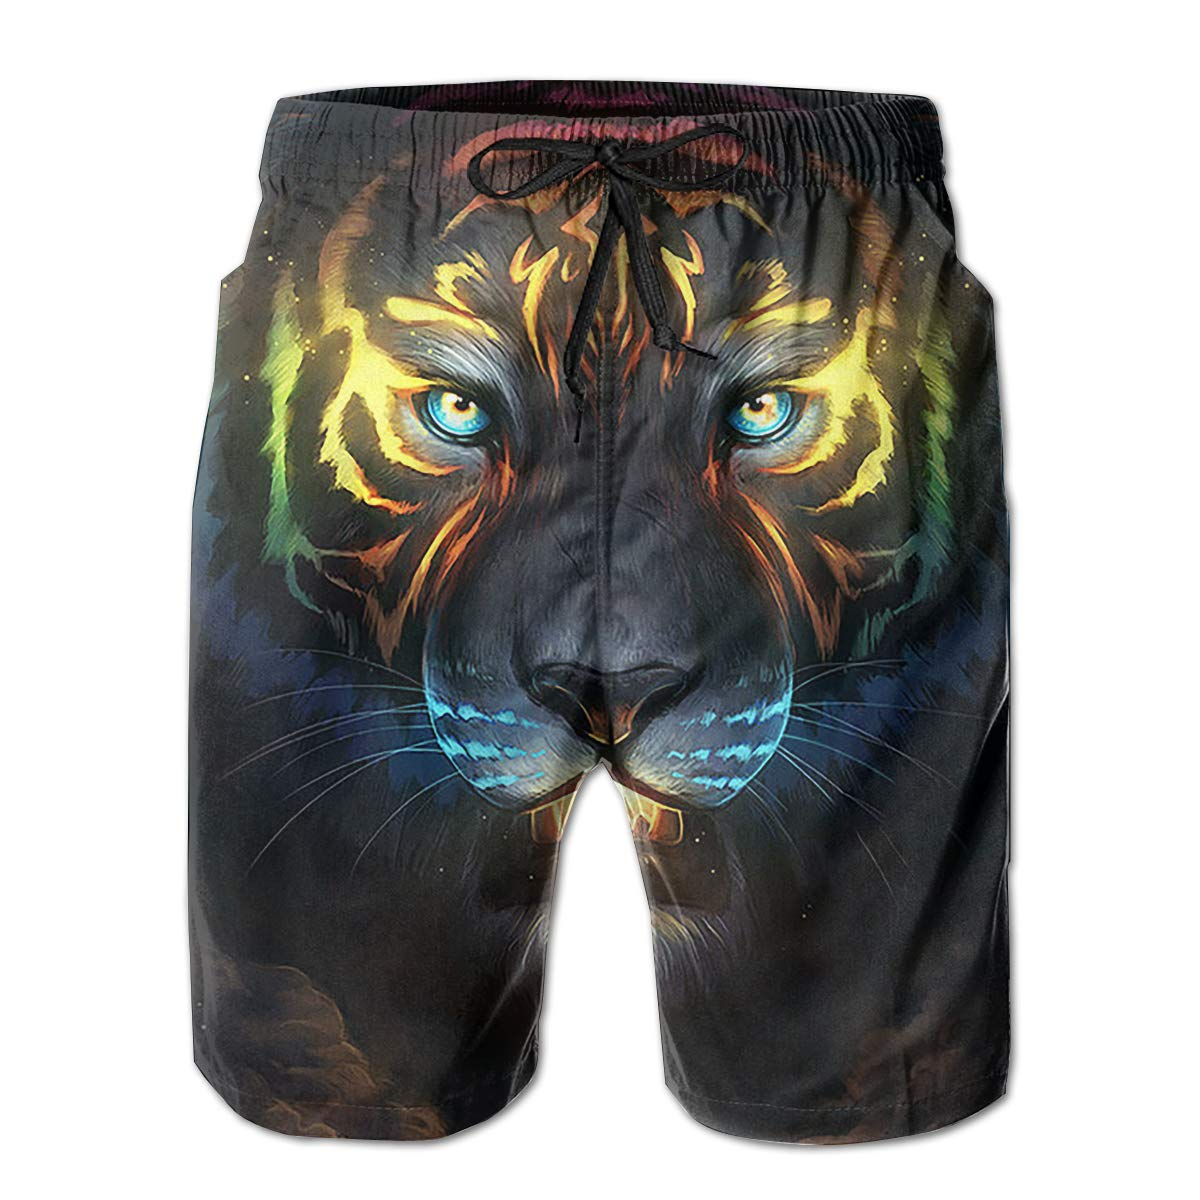 K-Dark Fantasy Spiritual Colorful Tiger Mens Summer Surf Board Short Swim Trunks Bathing Suit